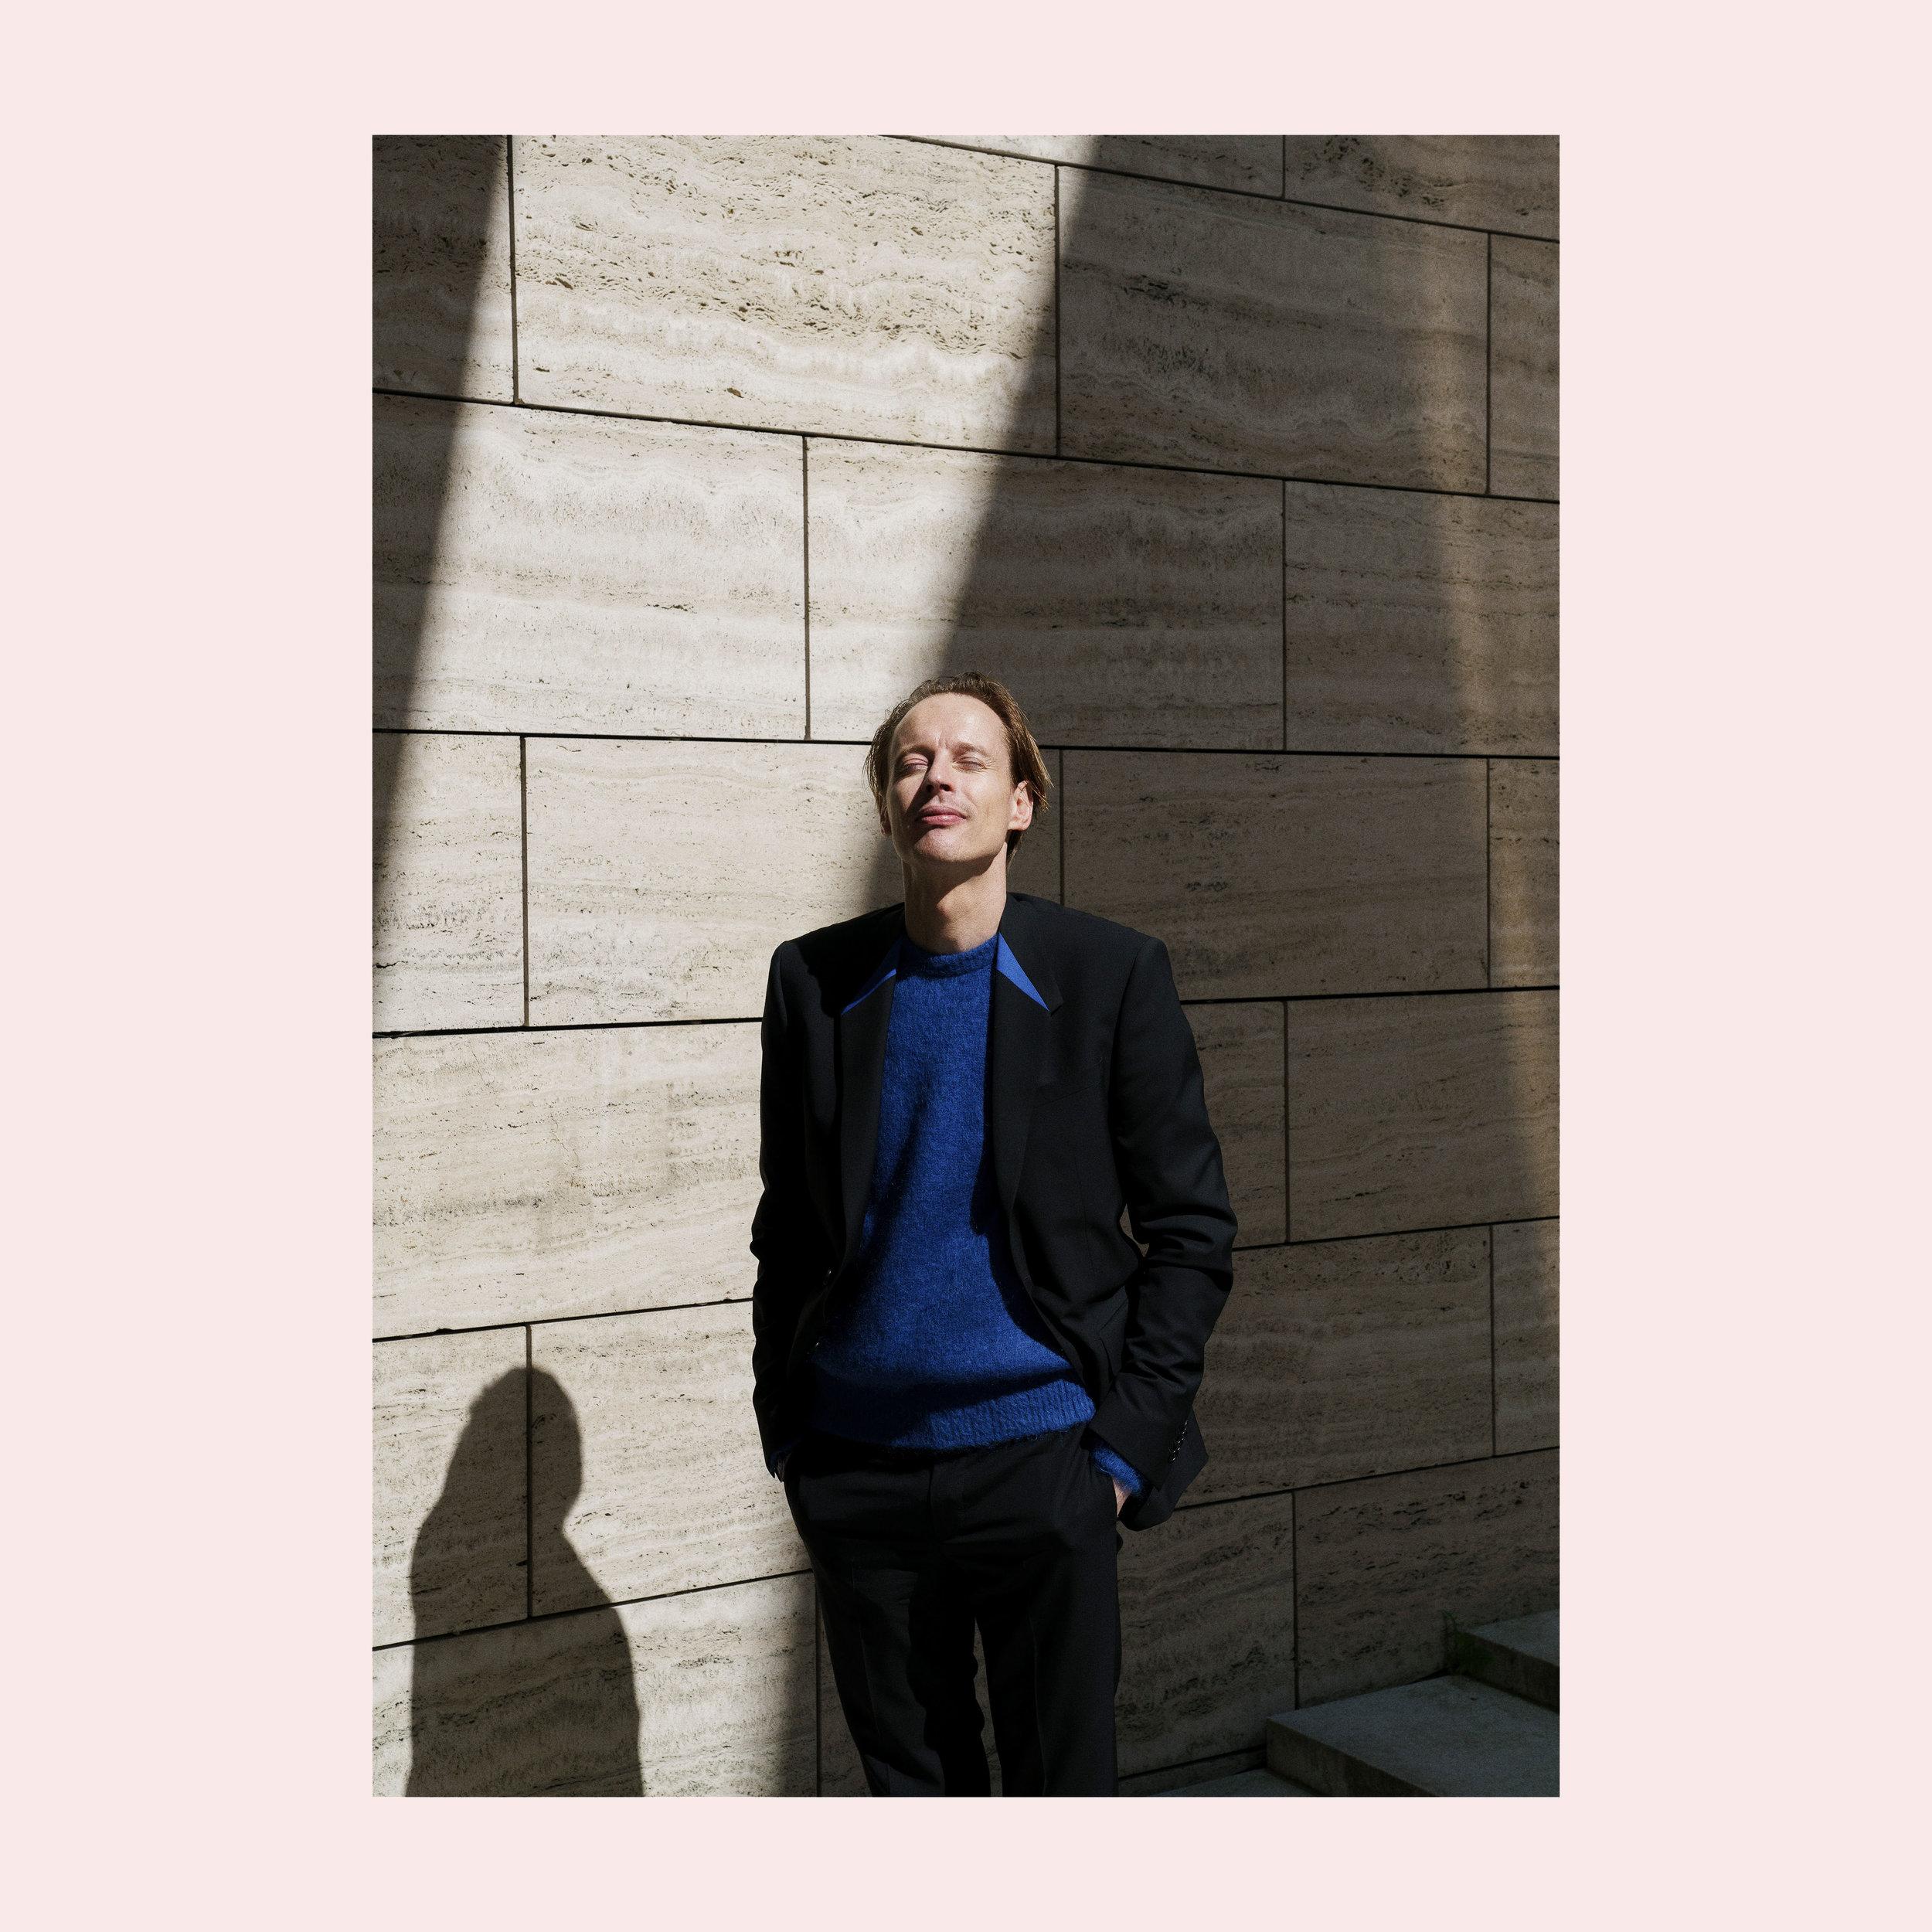 Daan Roosegaarde for Monocle Magazine.